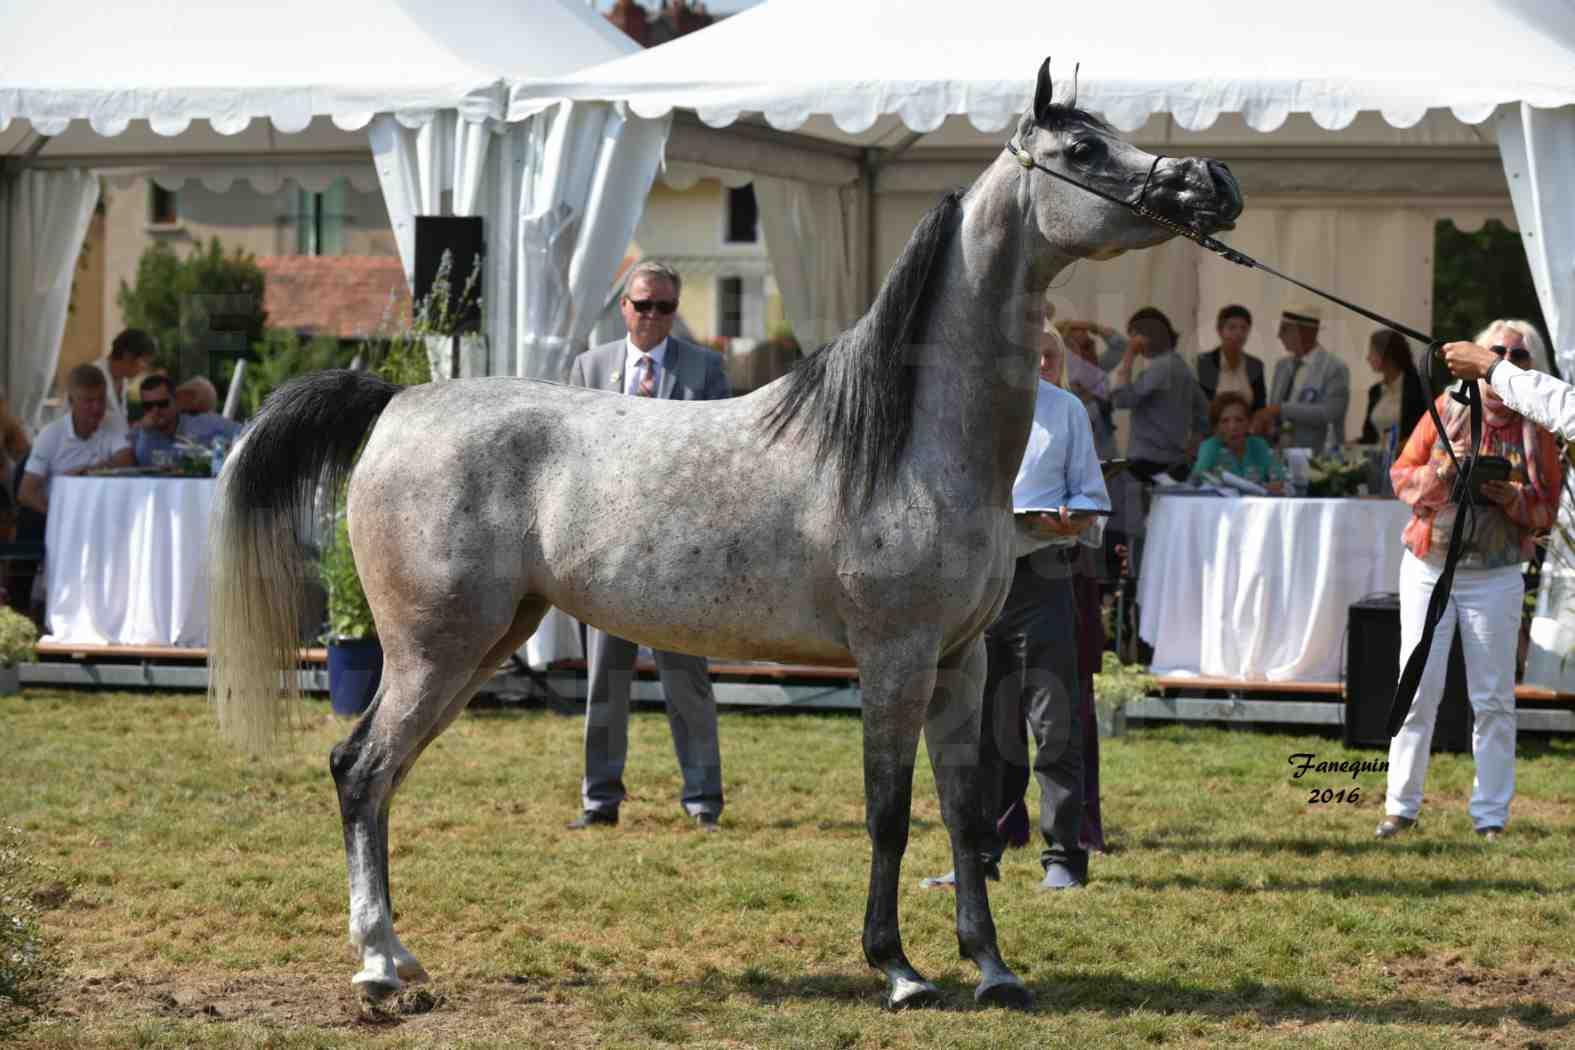 International Arabian Horse Show B de VICHY 2016 - ISABELLA - Notre Sélection - 08